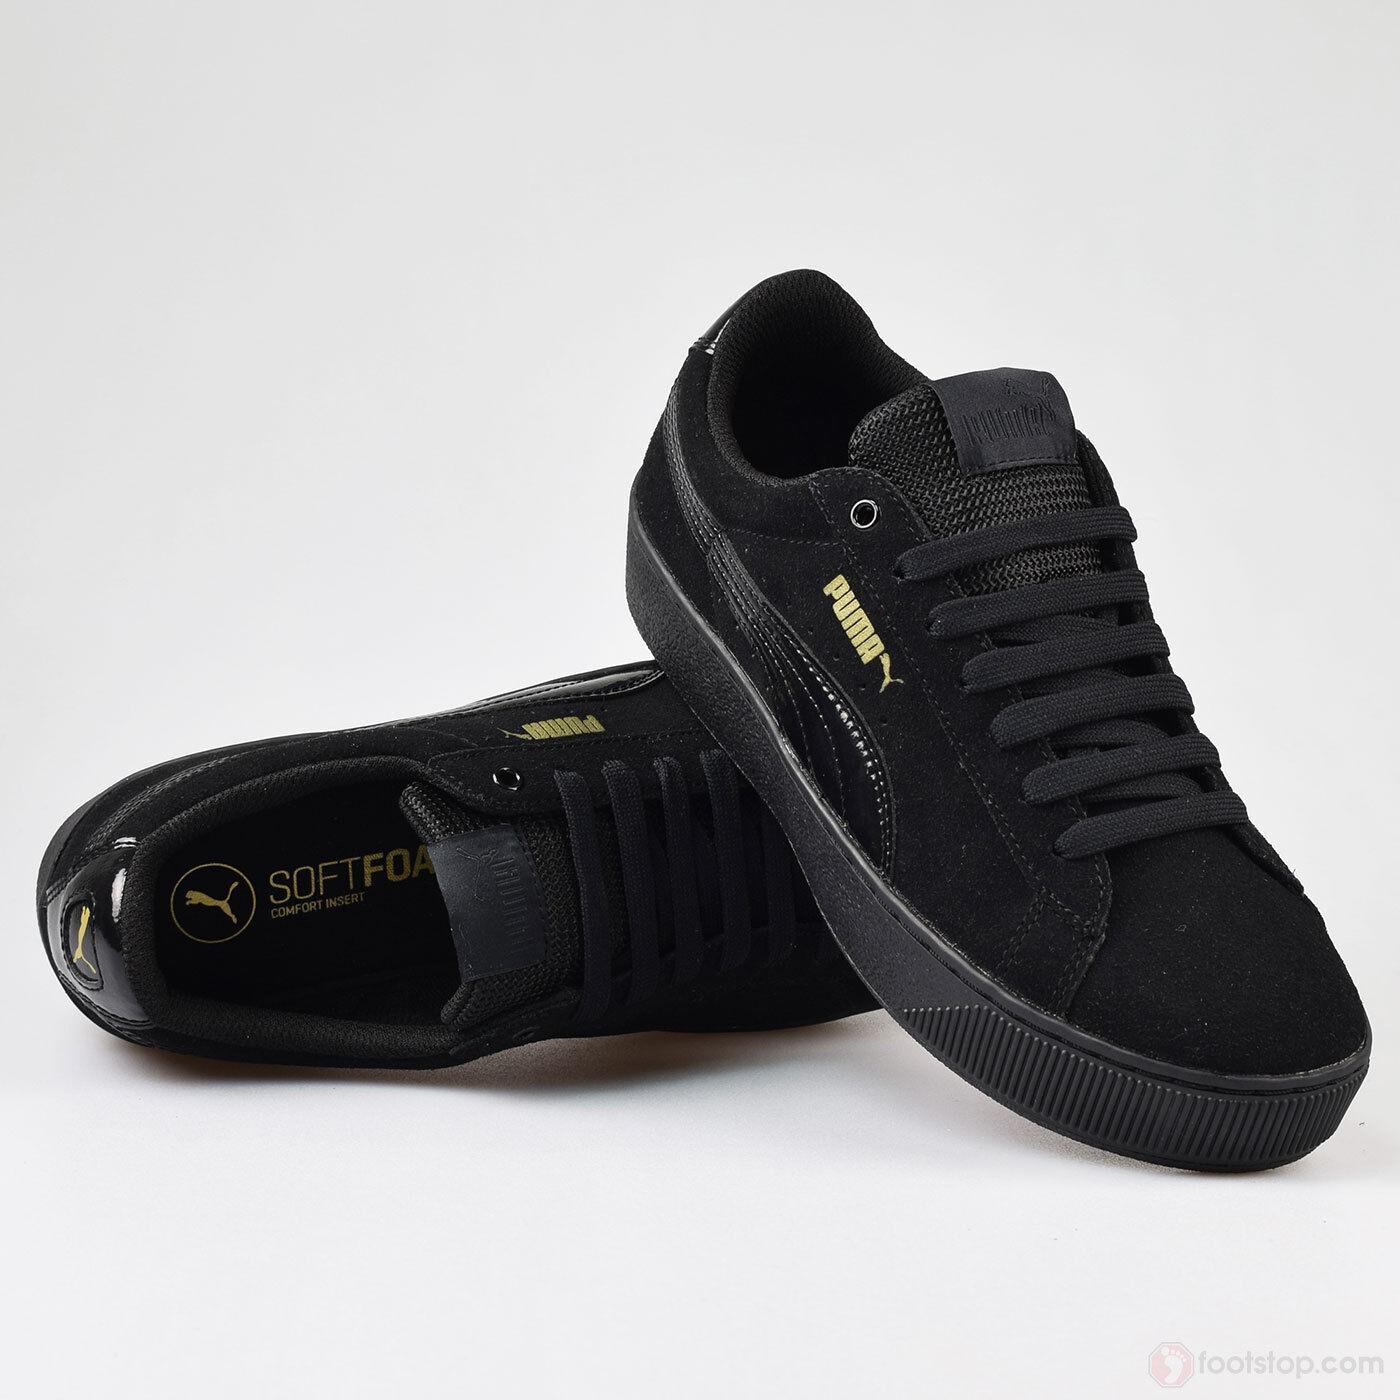 PUMA VIKKY PLATFORM zapatos ZAPATOS LIFESTYLE ORIGINAL NEGRO 363287 363287 363287 02  elige tu favorito